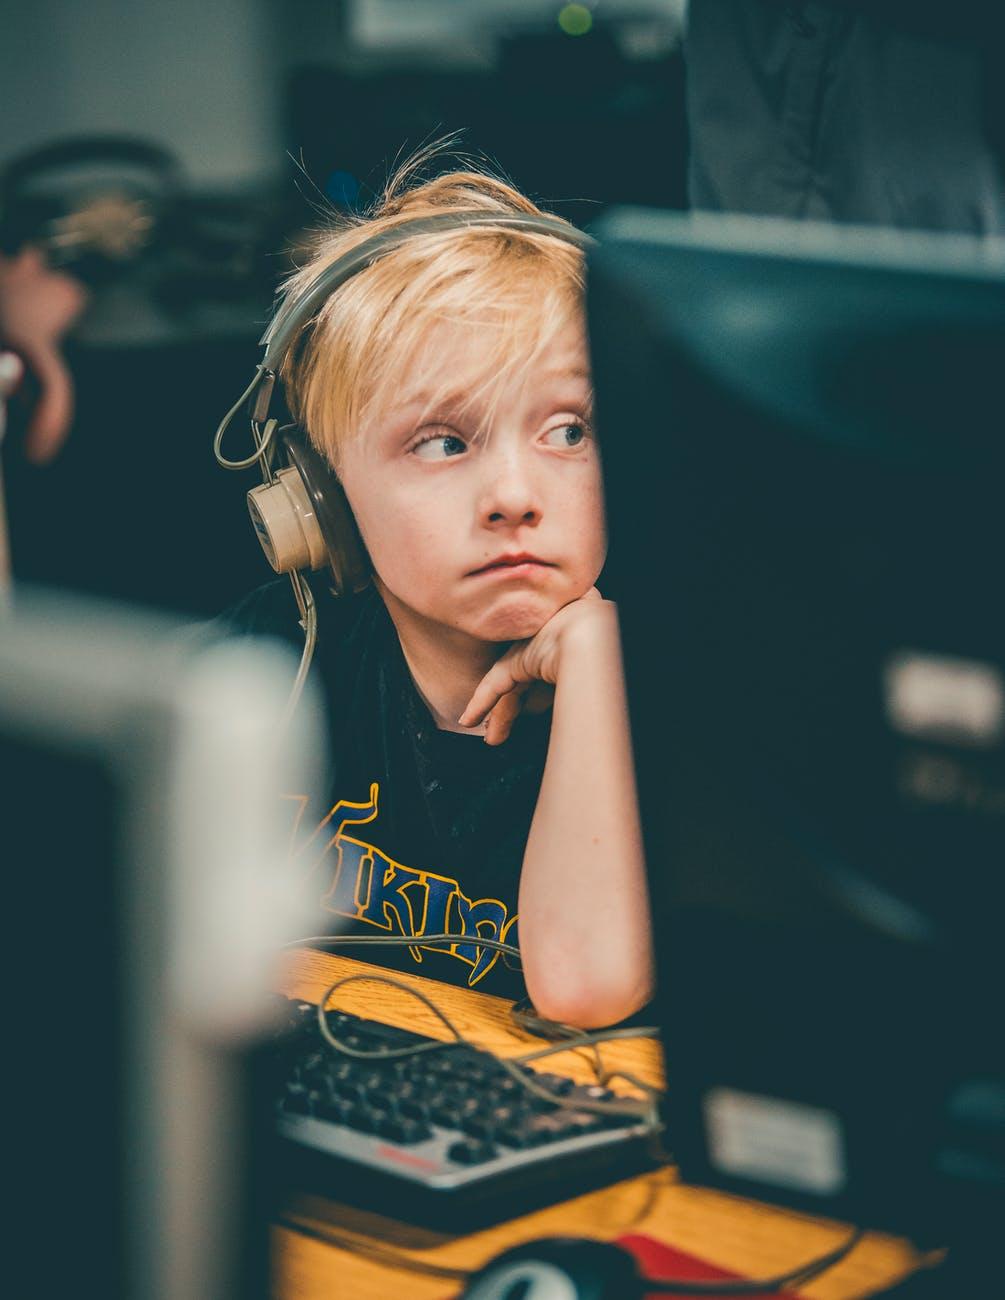 photo of boy wearing headphone